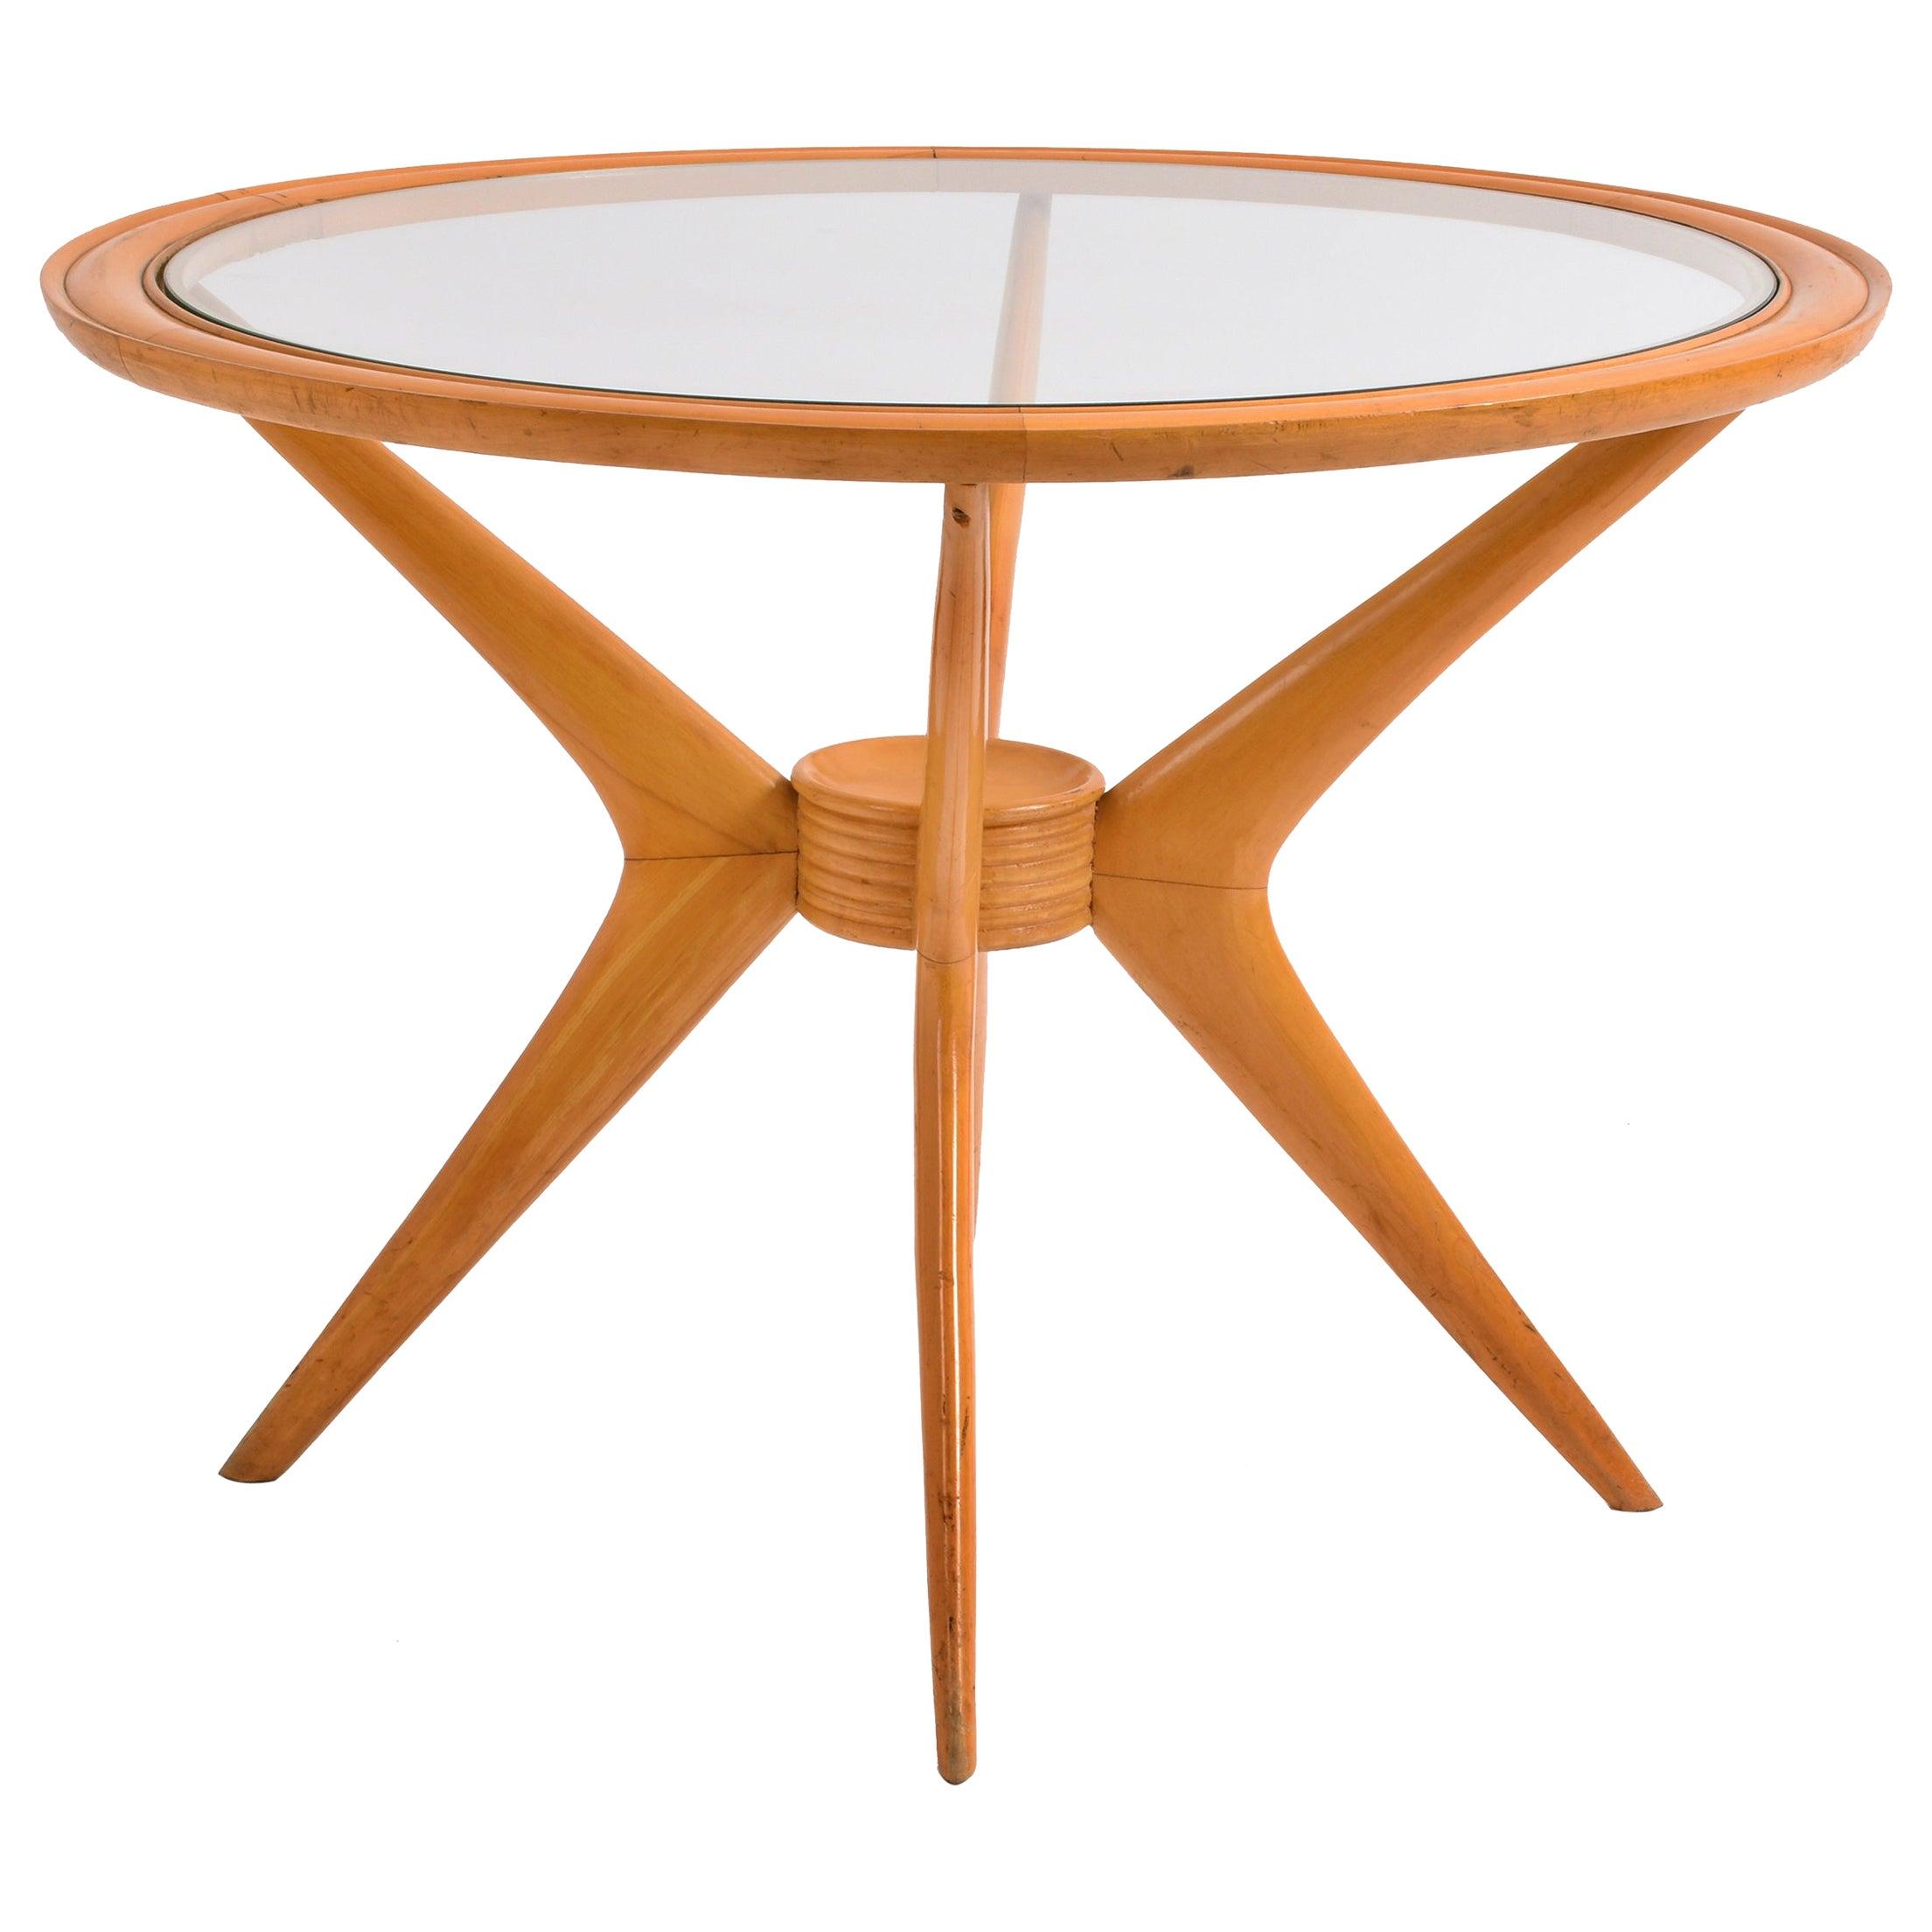 Cesare Lacca Midcentury Birchwood Italian Coffee Table for Cassina, 1950s